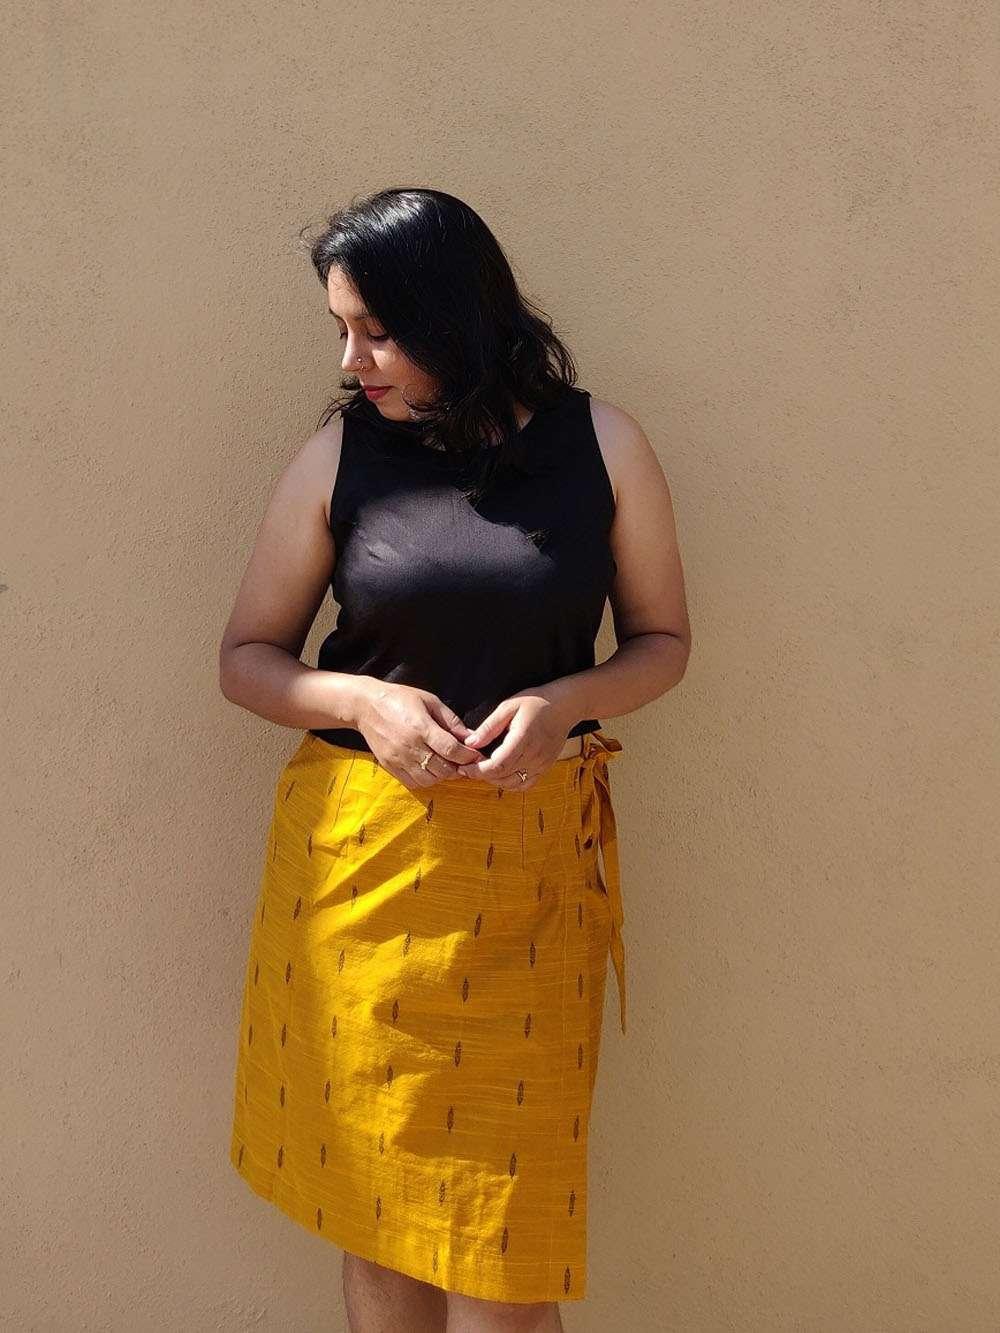 Mustard Yellow Cotton Silk Wrap Skirt and Black Crop